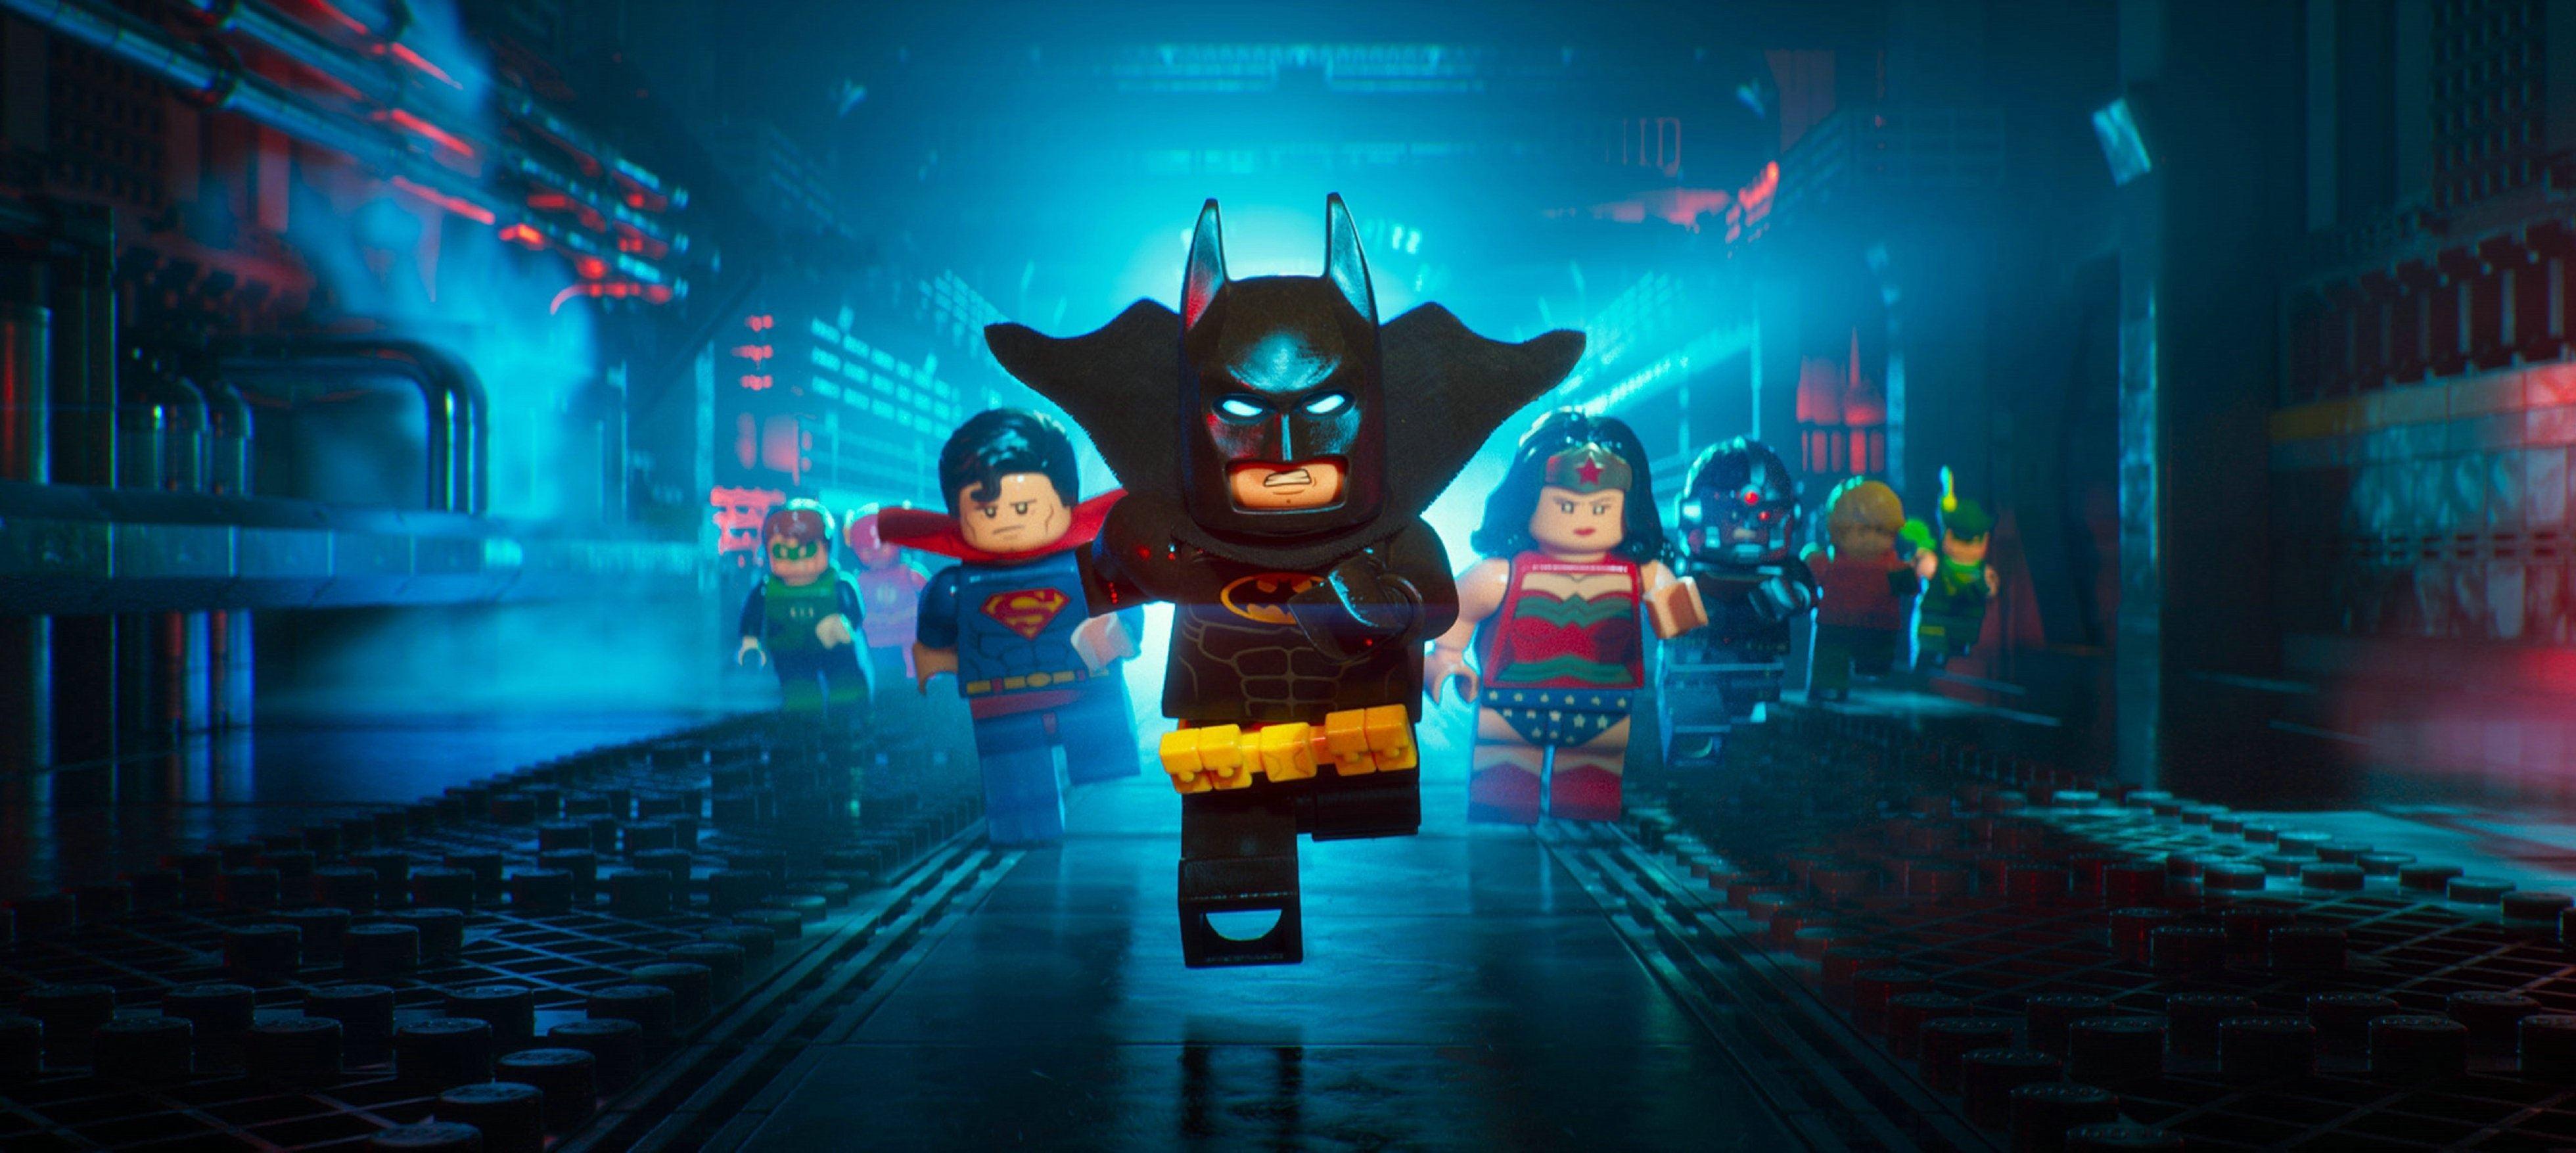 The Lego Batman Movie wallpaper 2